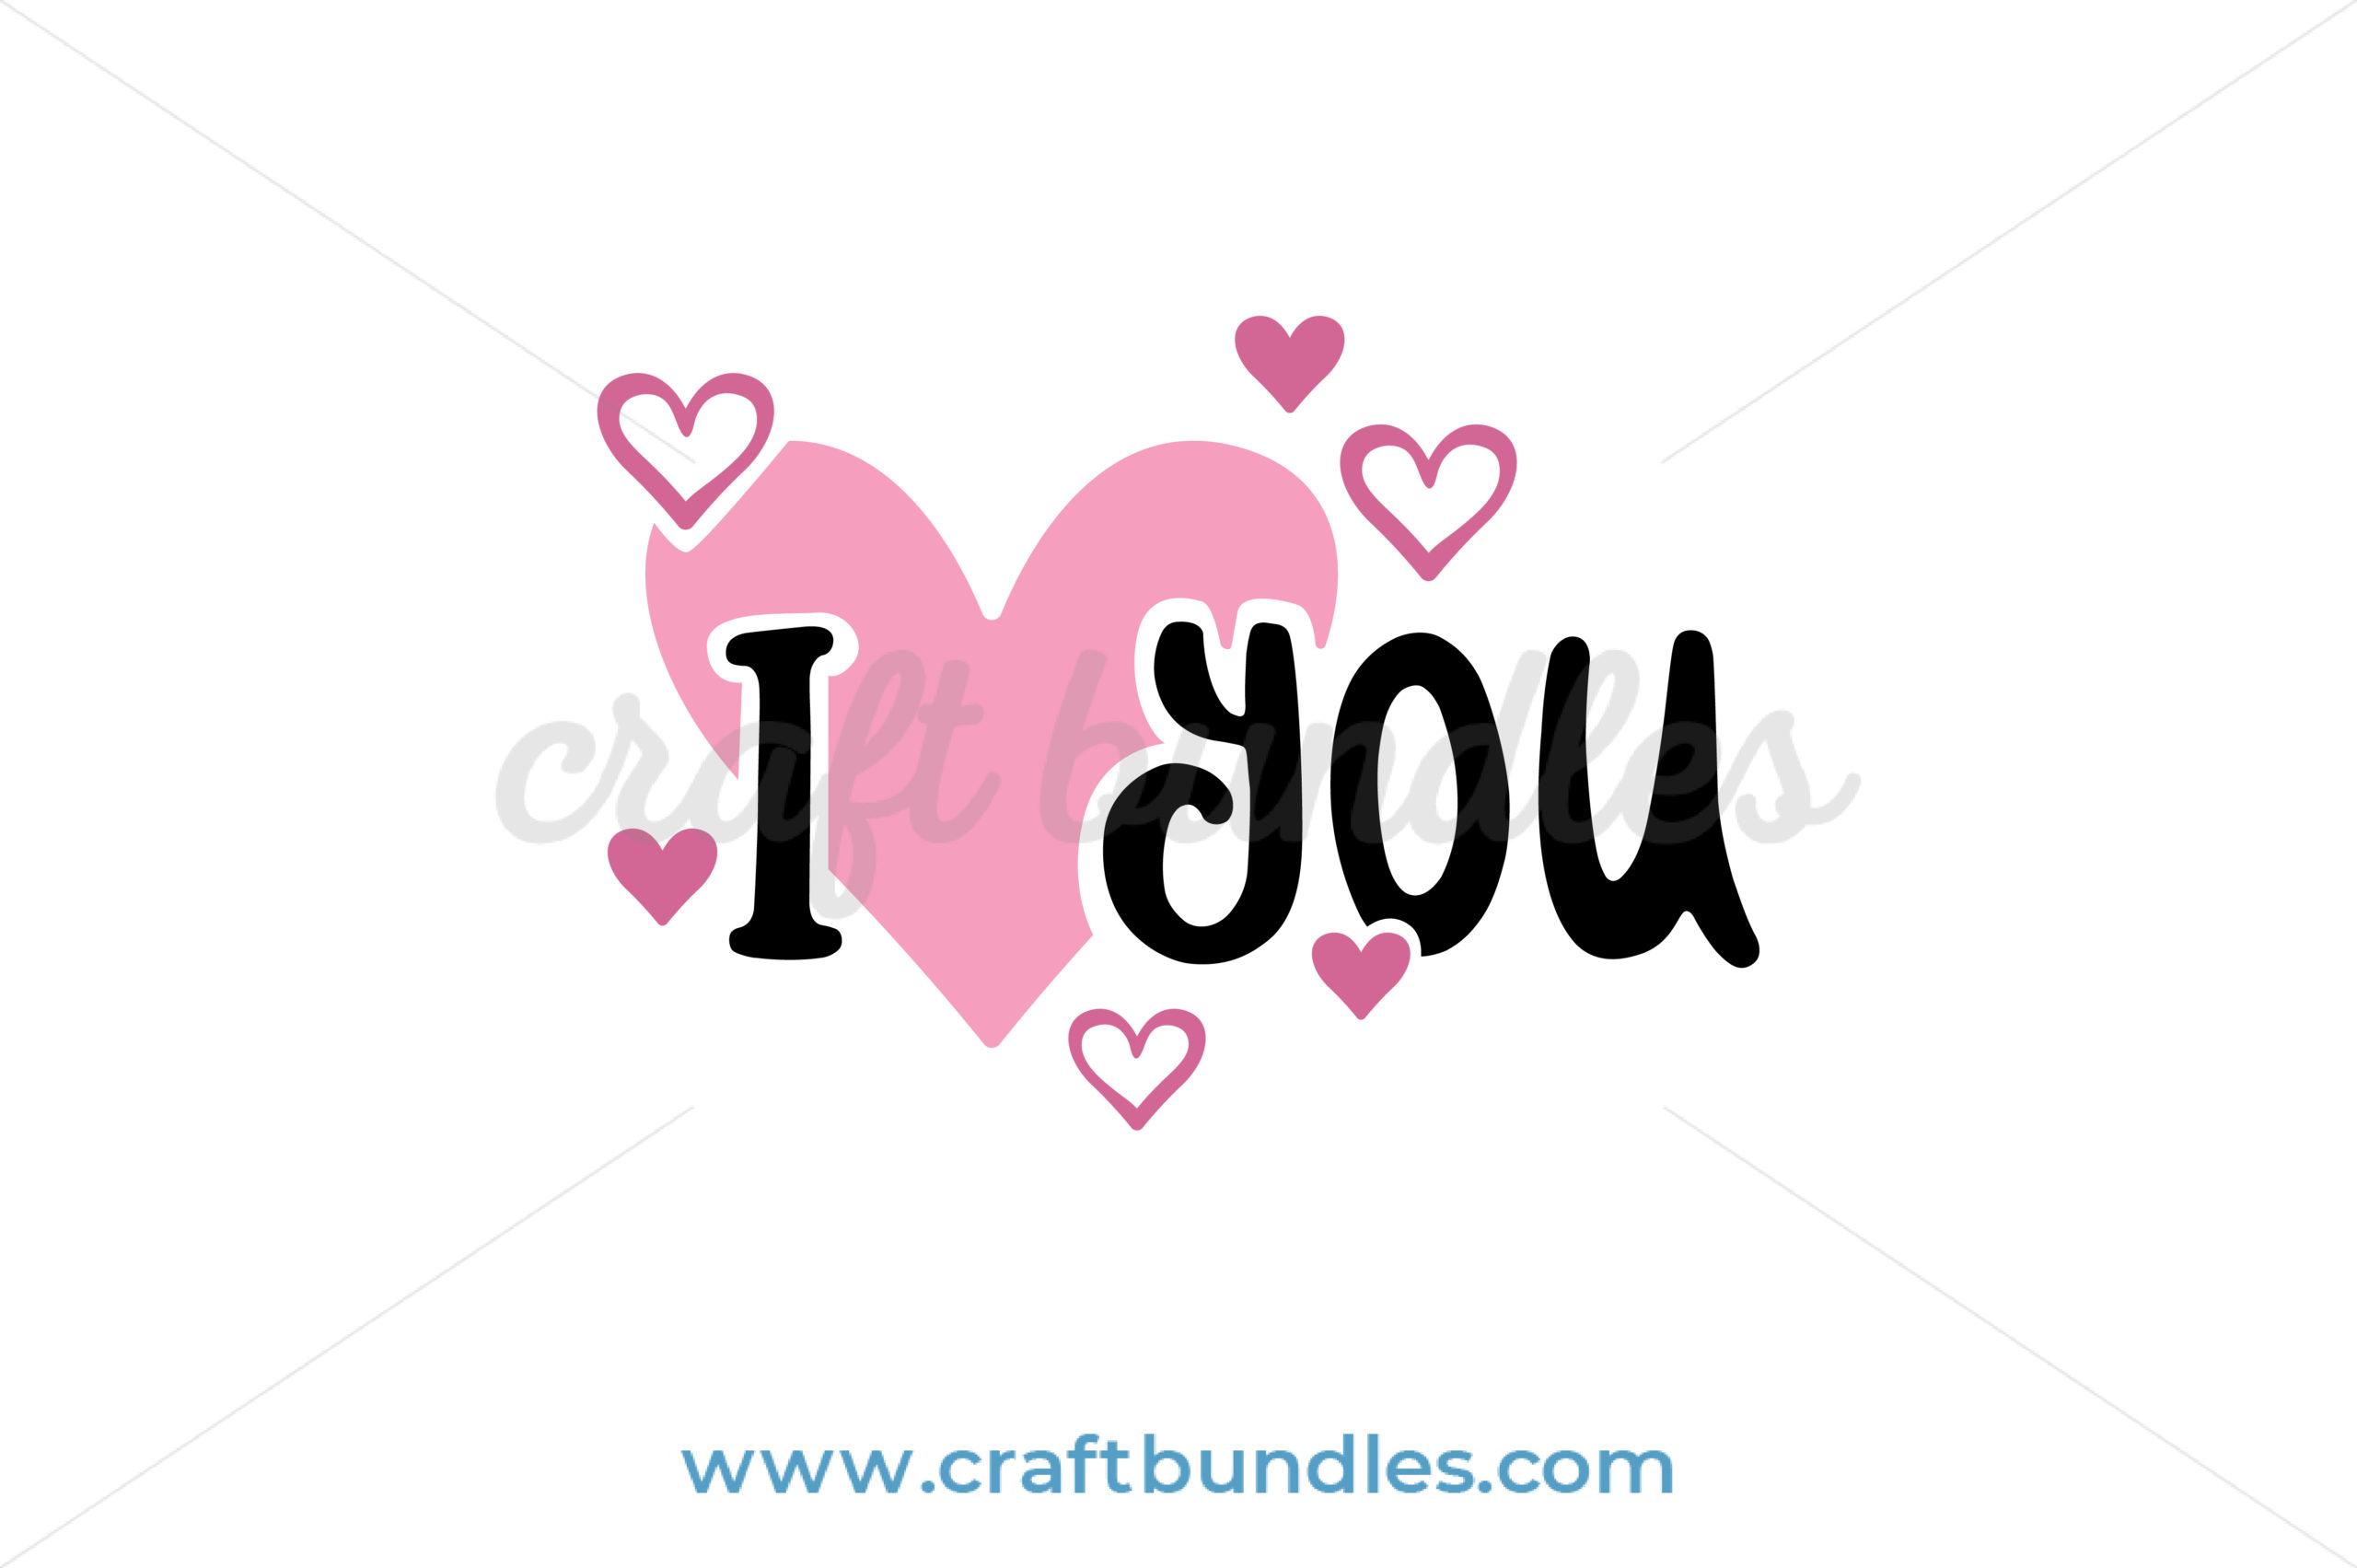 Download Love Quote SVG Cut File - CraftBundles